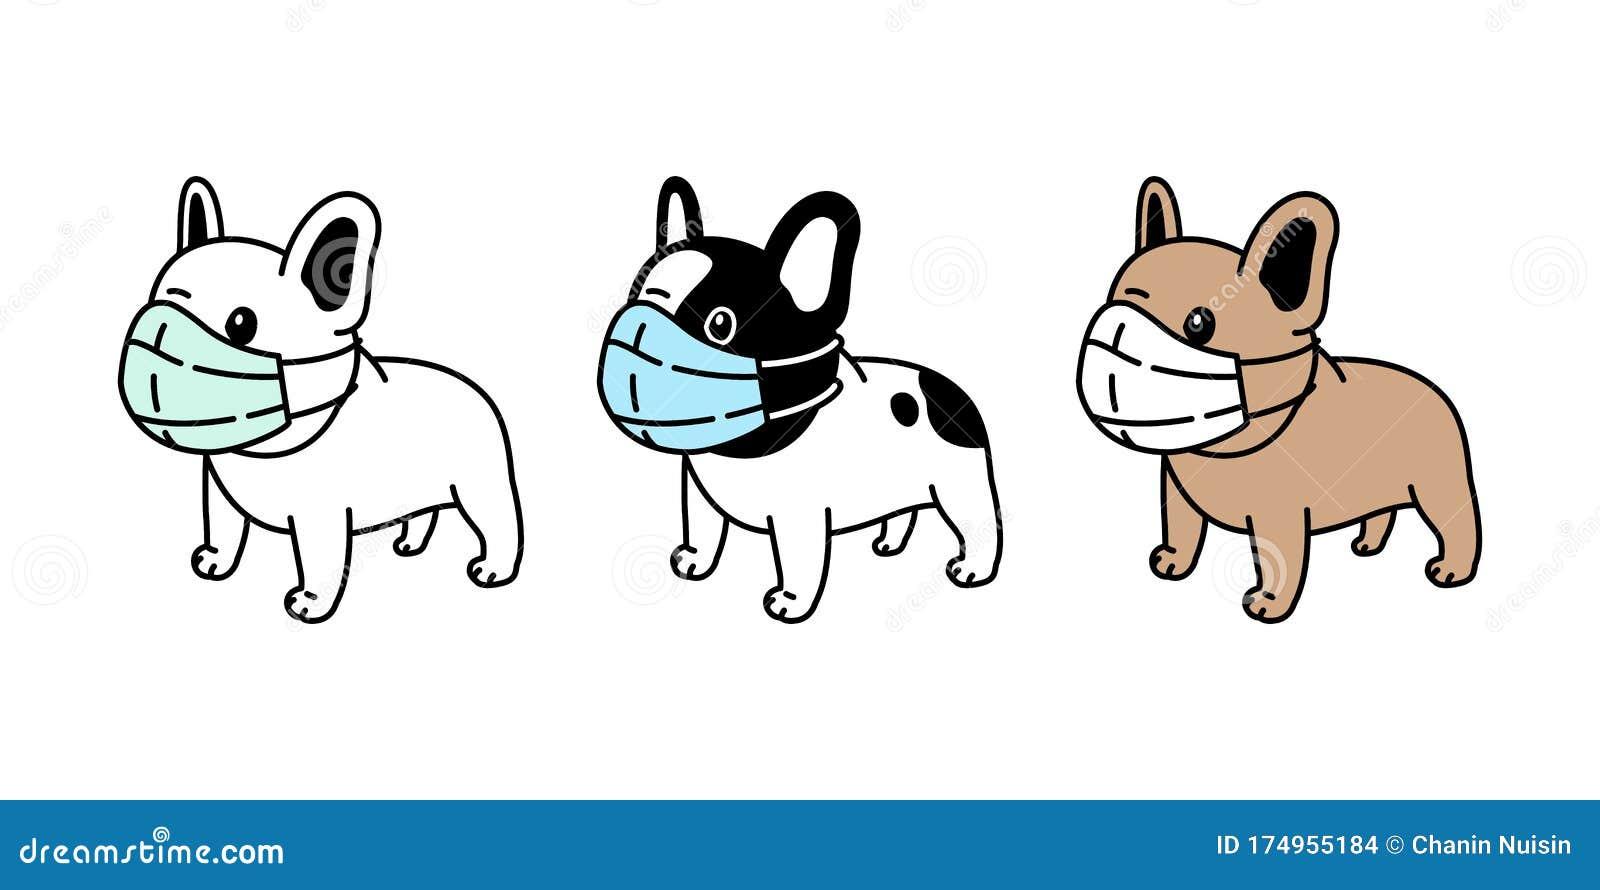 Dog Vector Face Mask Covid 19 French Bulldog Coronavirus Virus Pm